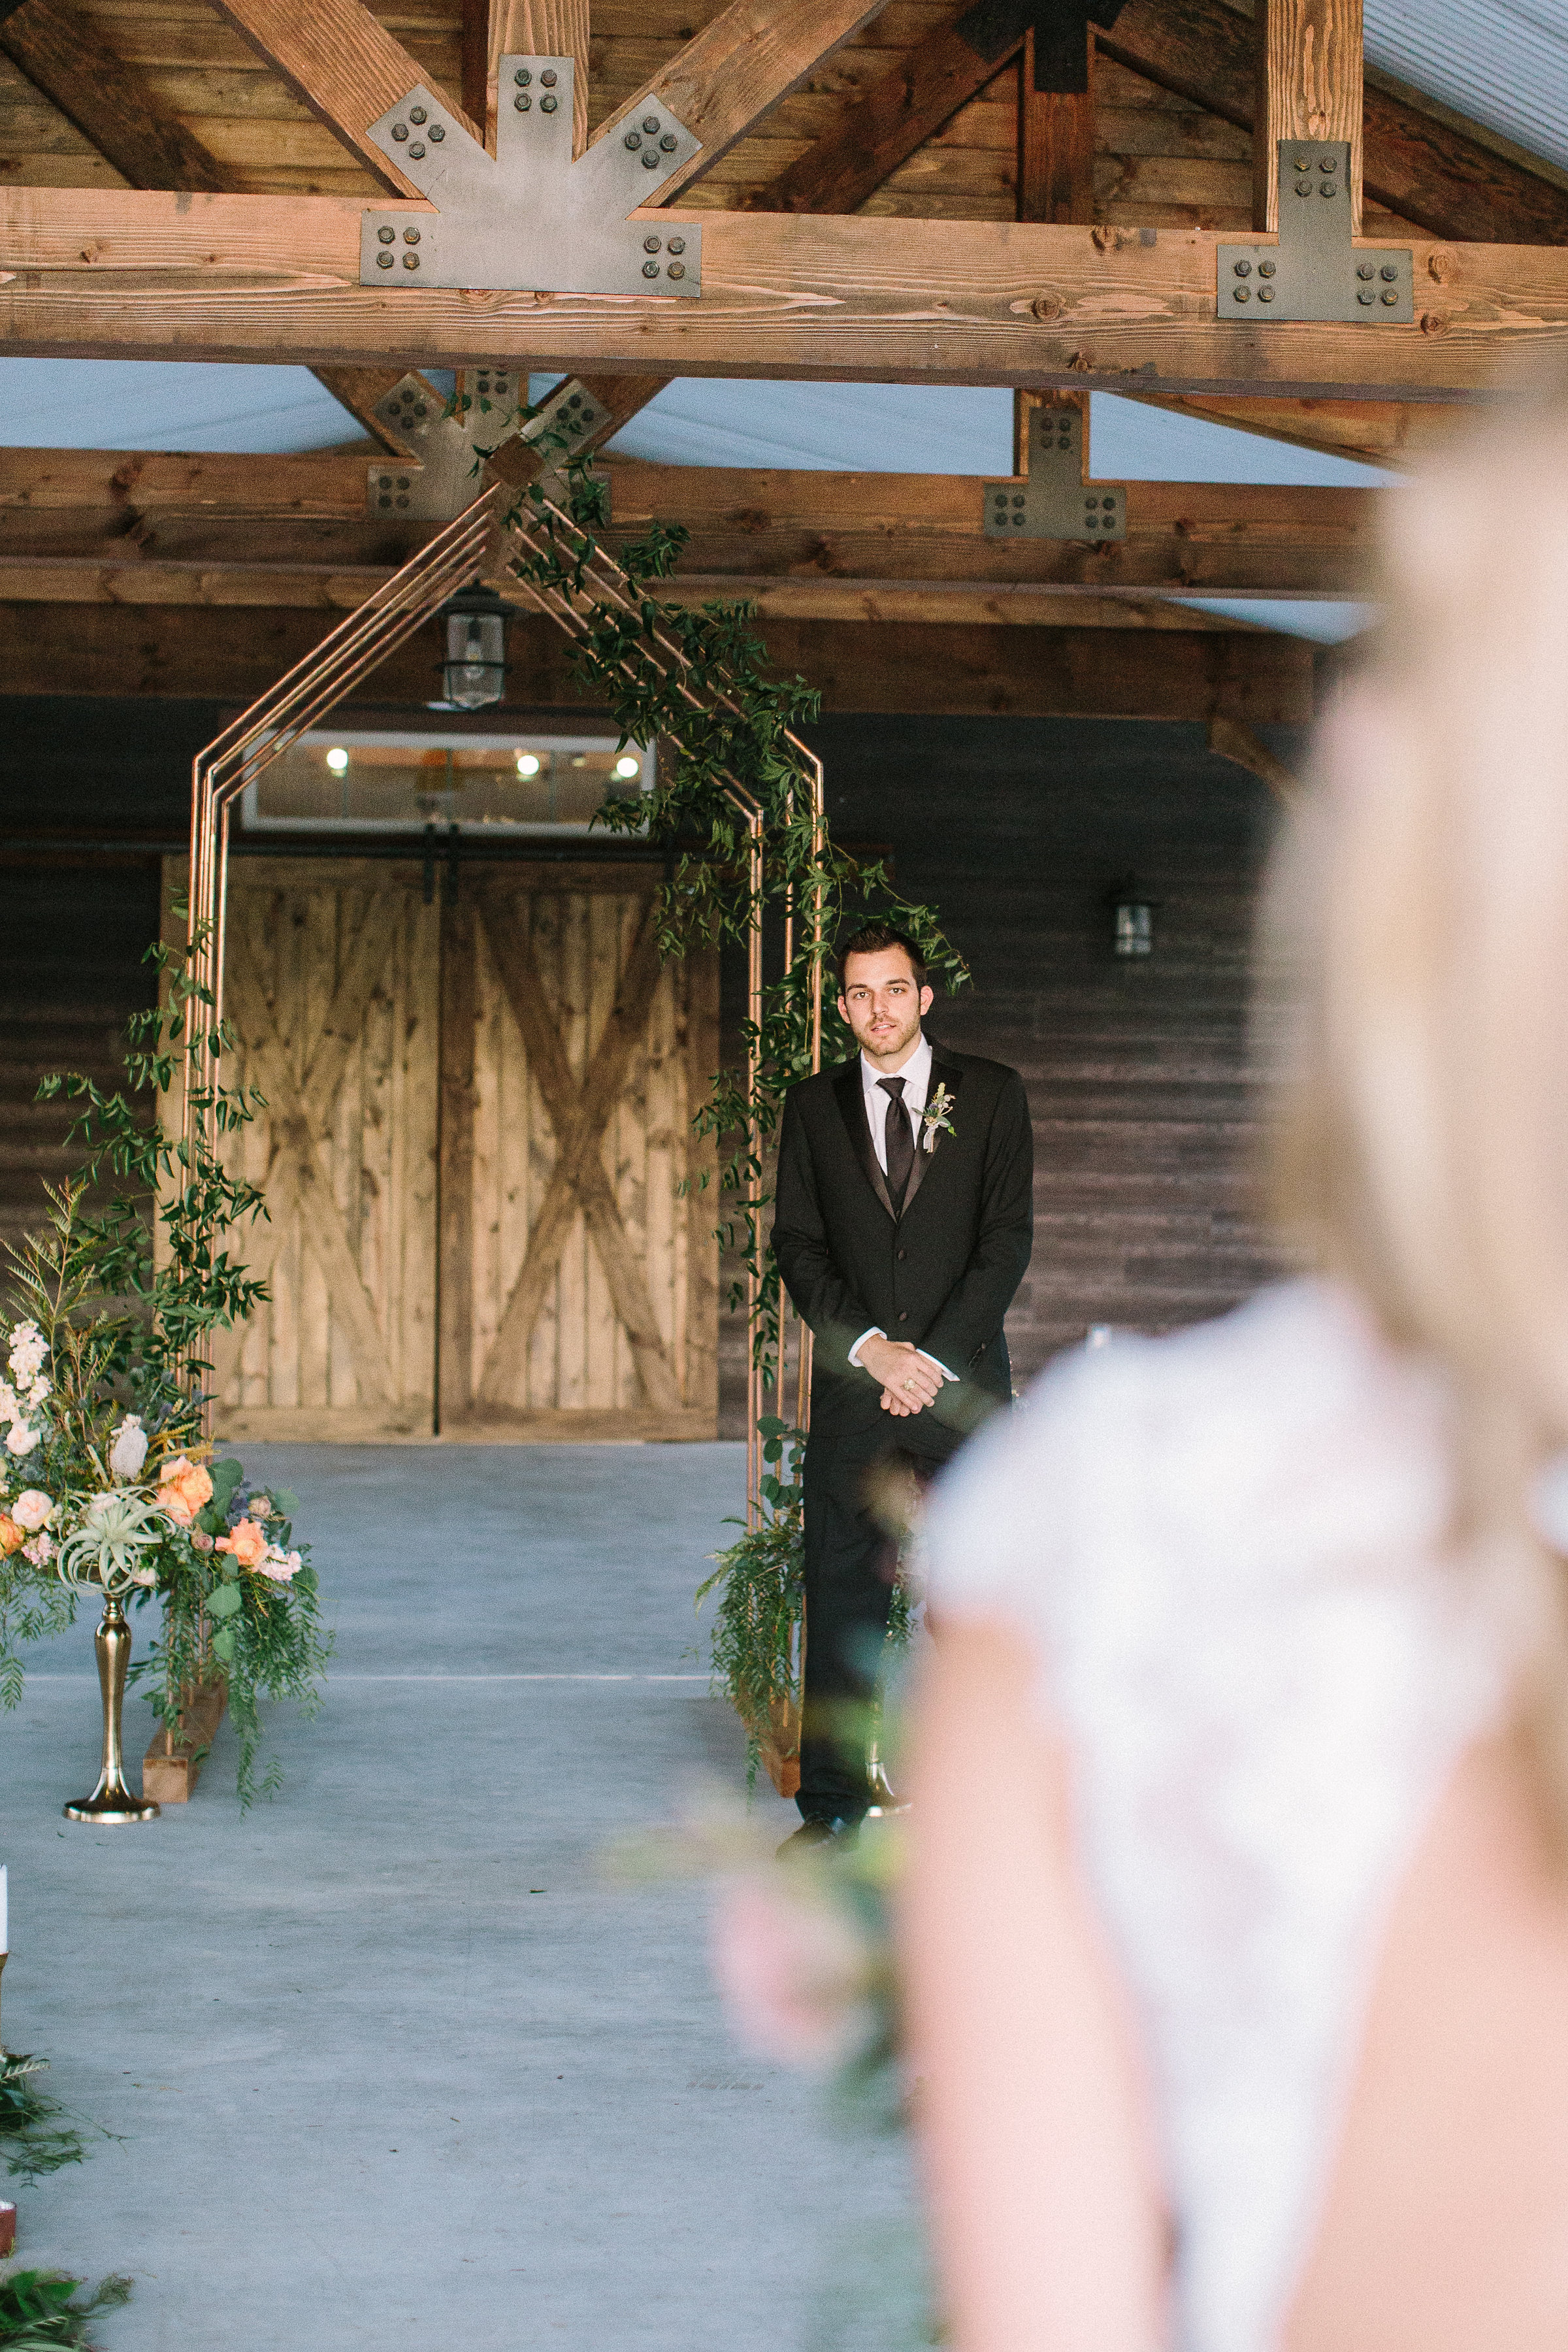 Ellen-Ashton-Photography-Peach-Creek-Ranch-Weddings-Wed-and-Prosper371